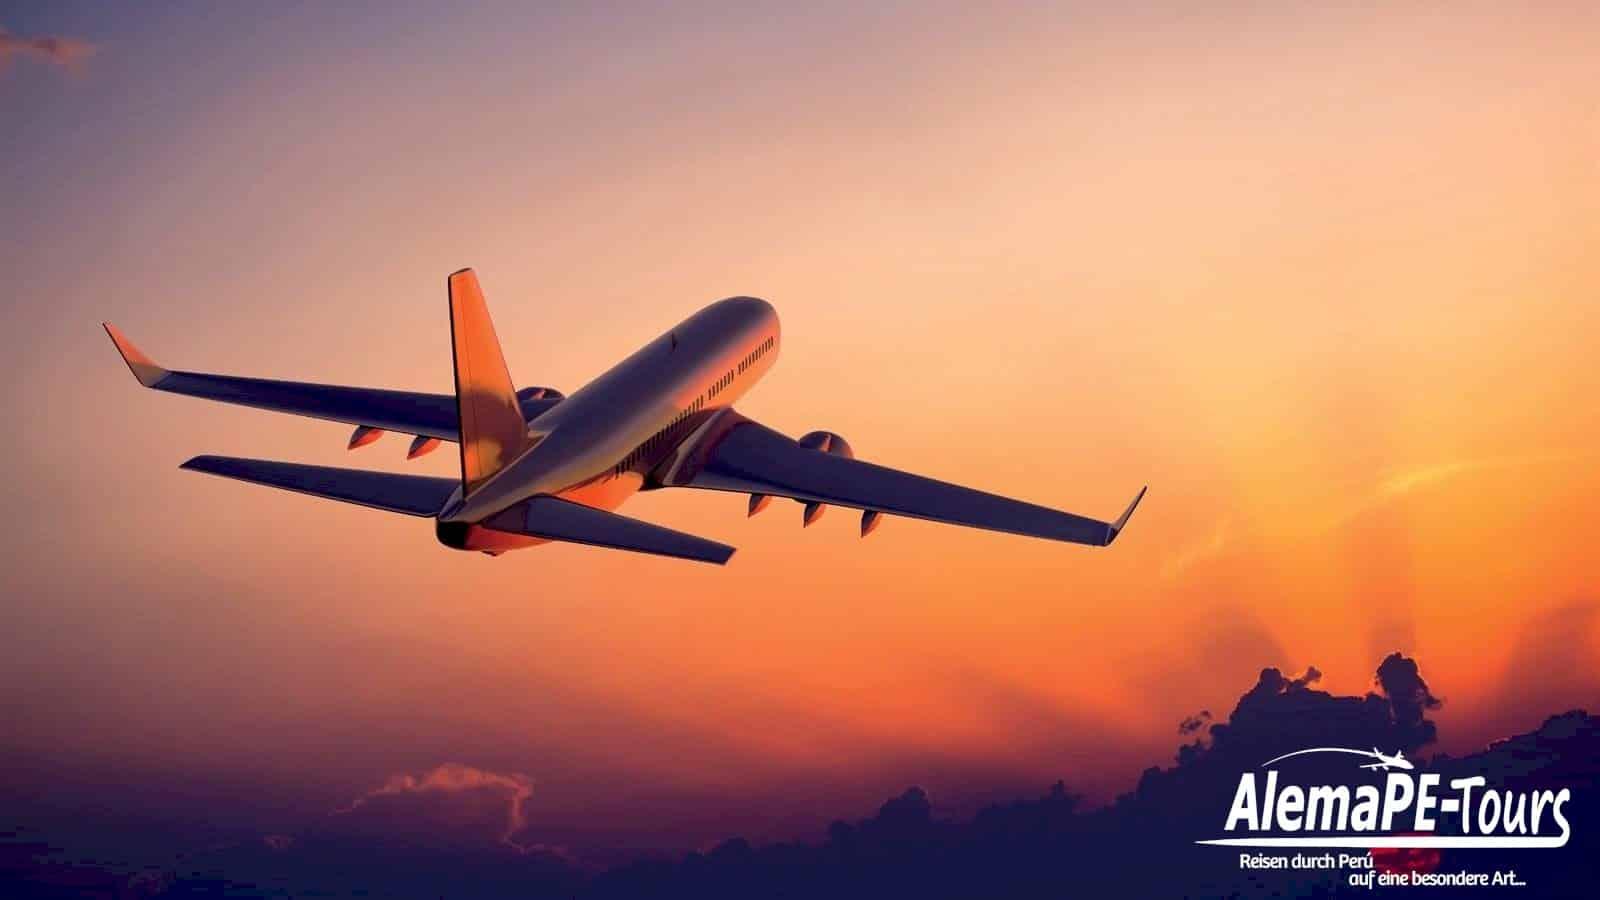 Entspanntes Flugreisen